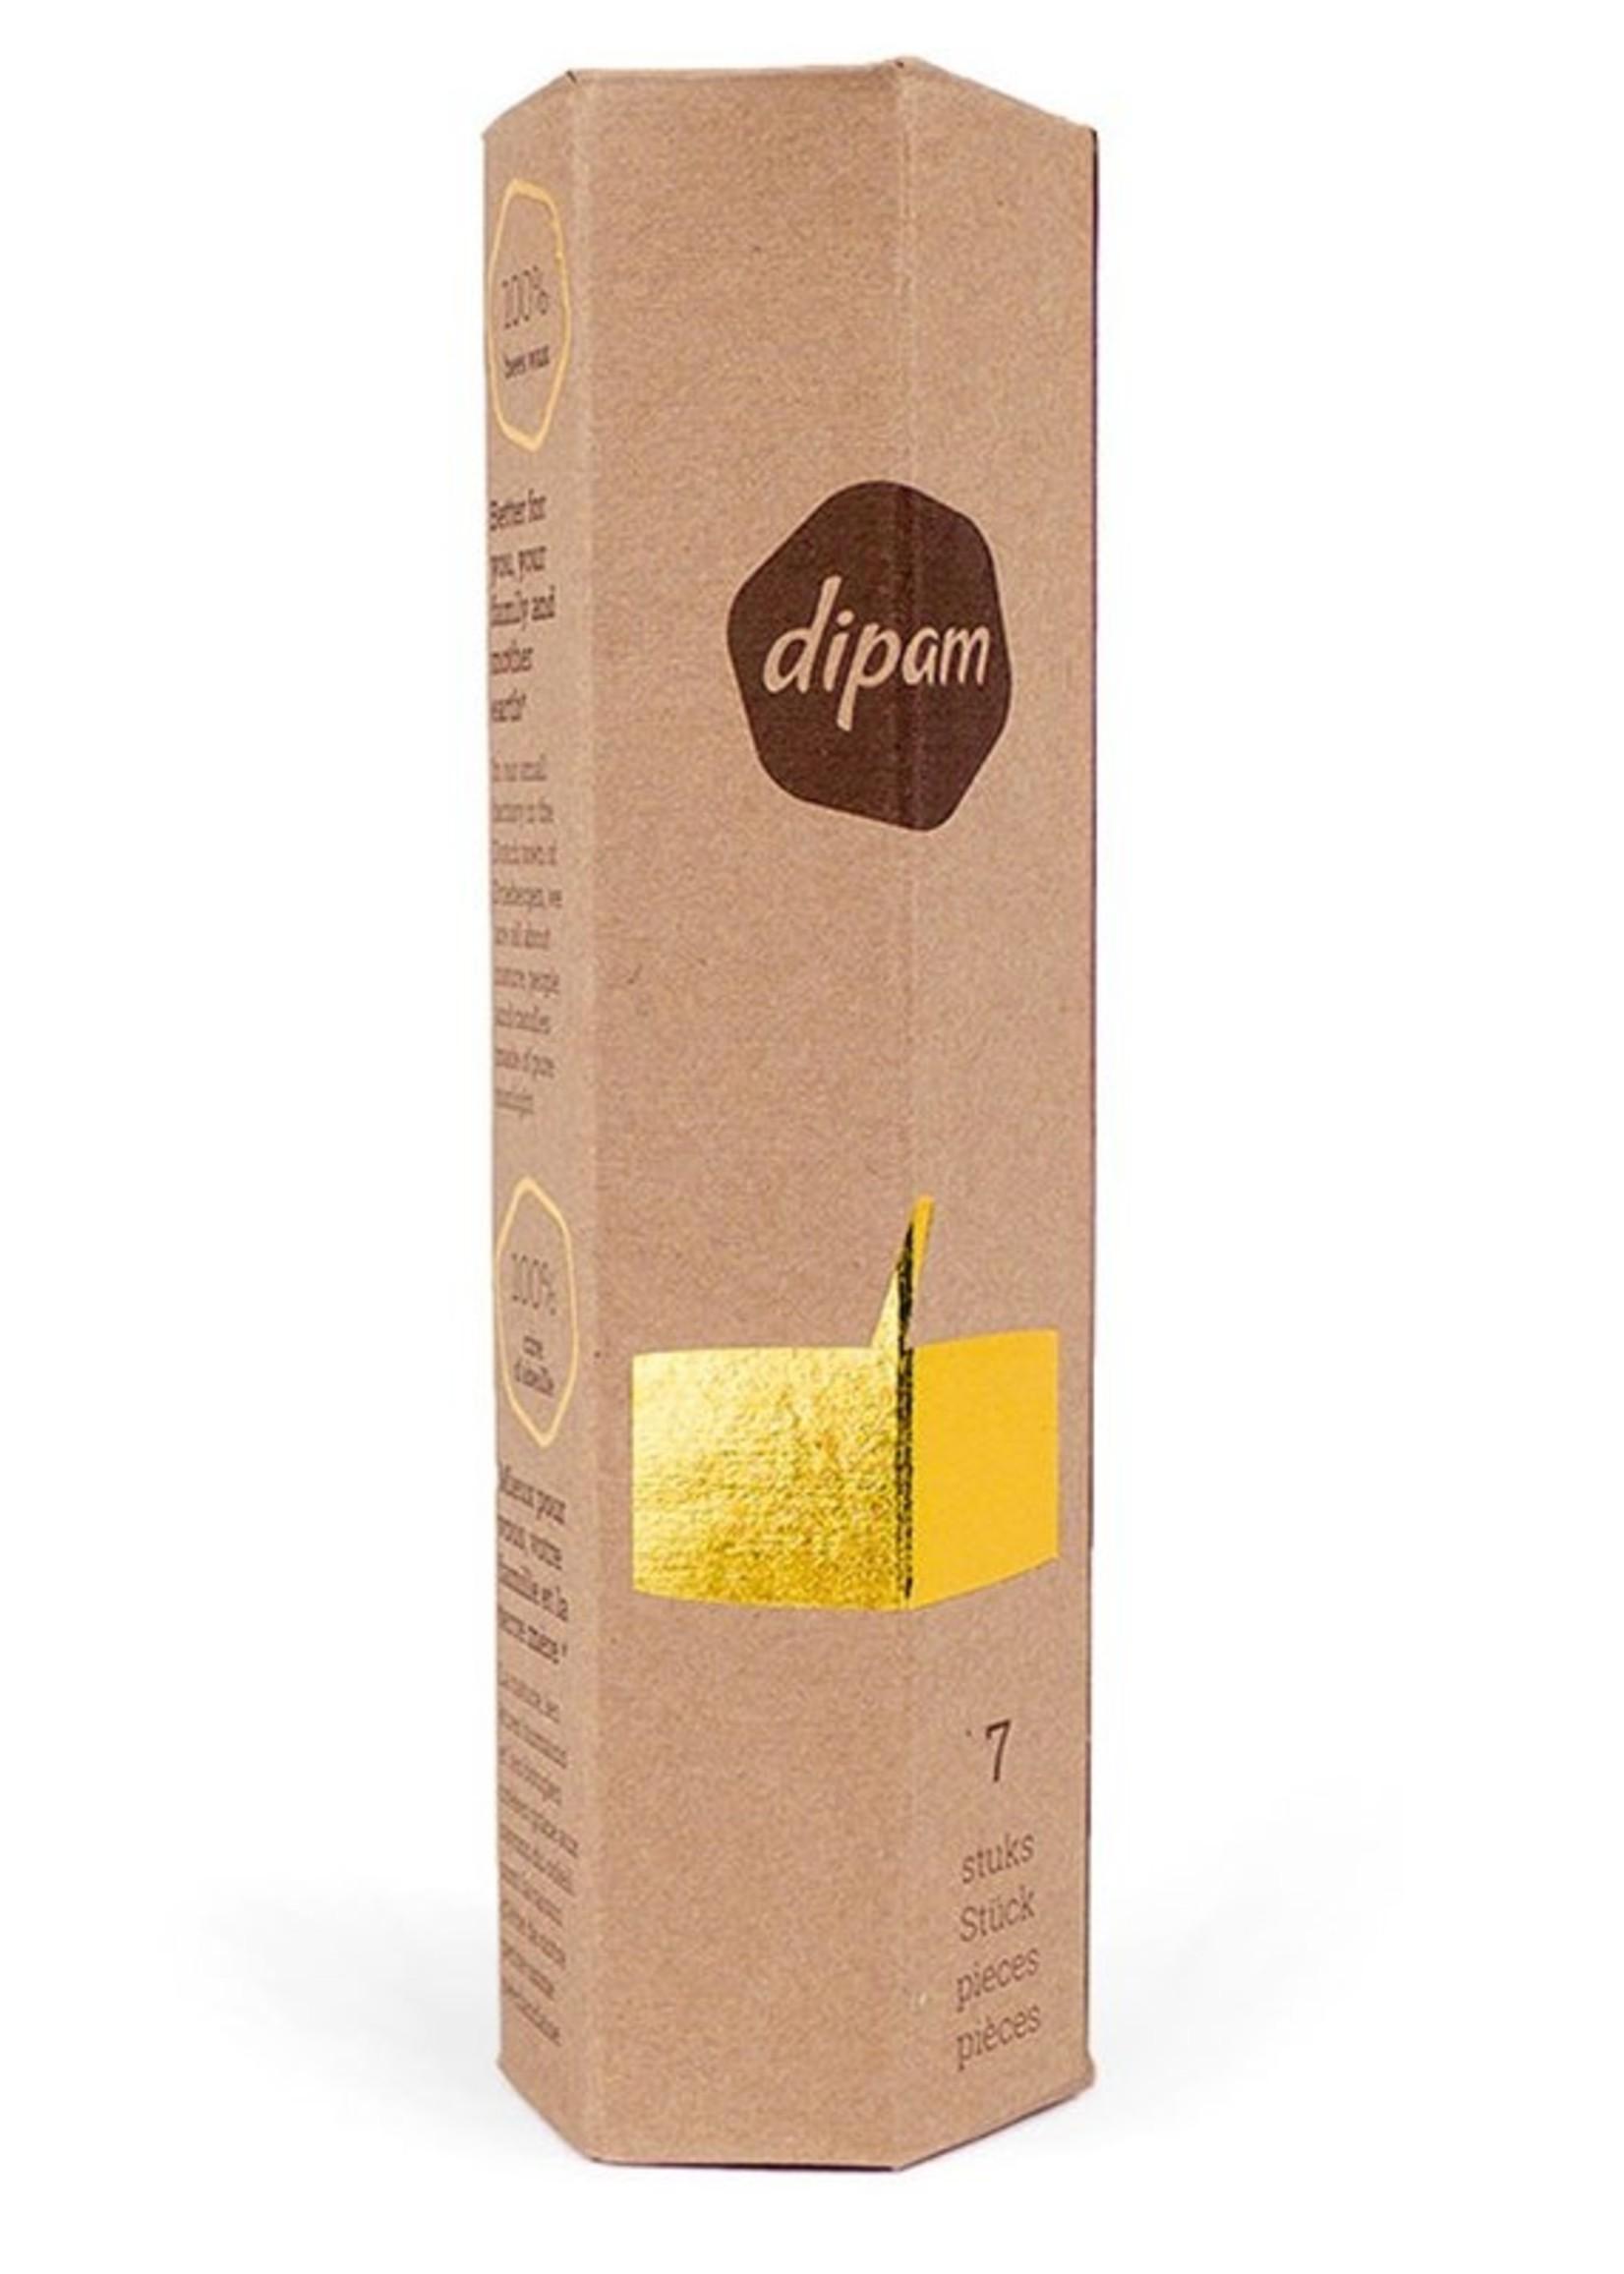 Dipam Dipam bijenwastheelichtjes in cadeauverpakking